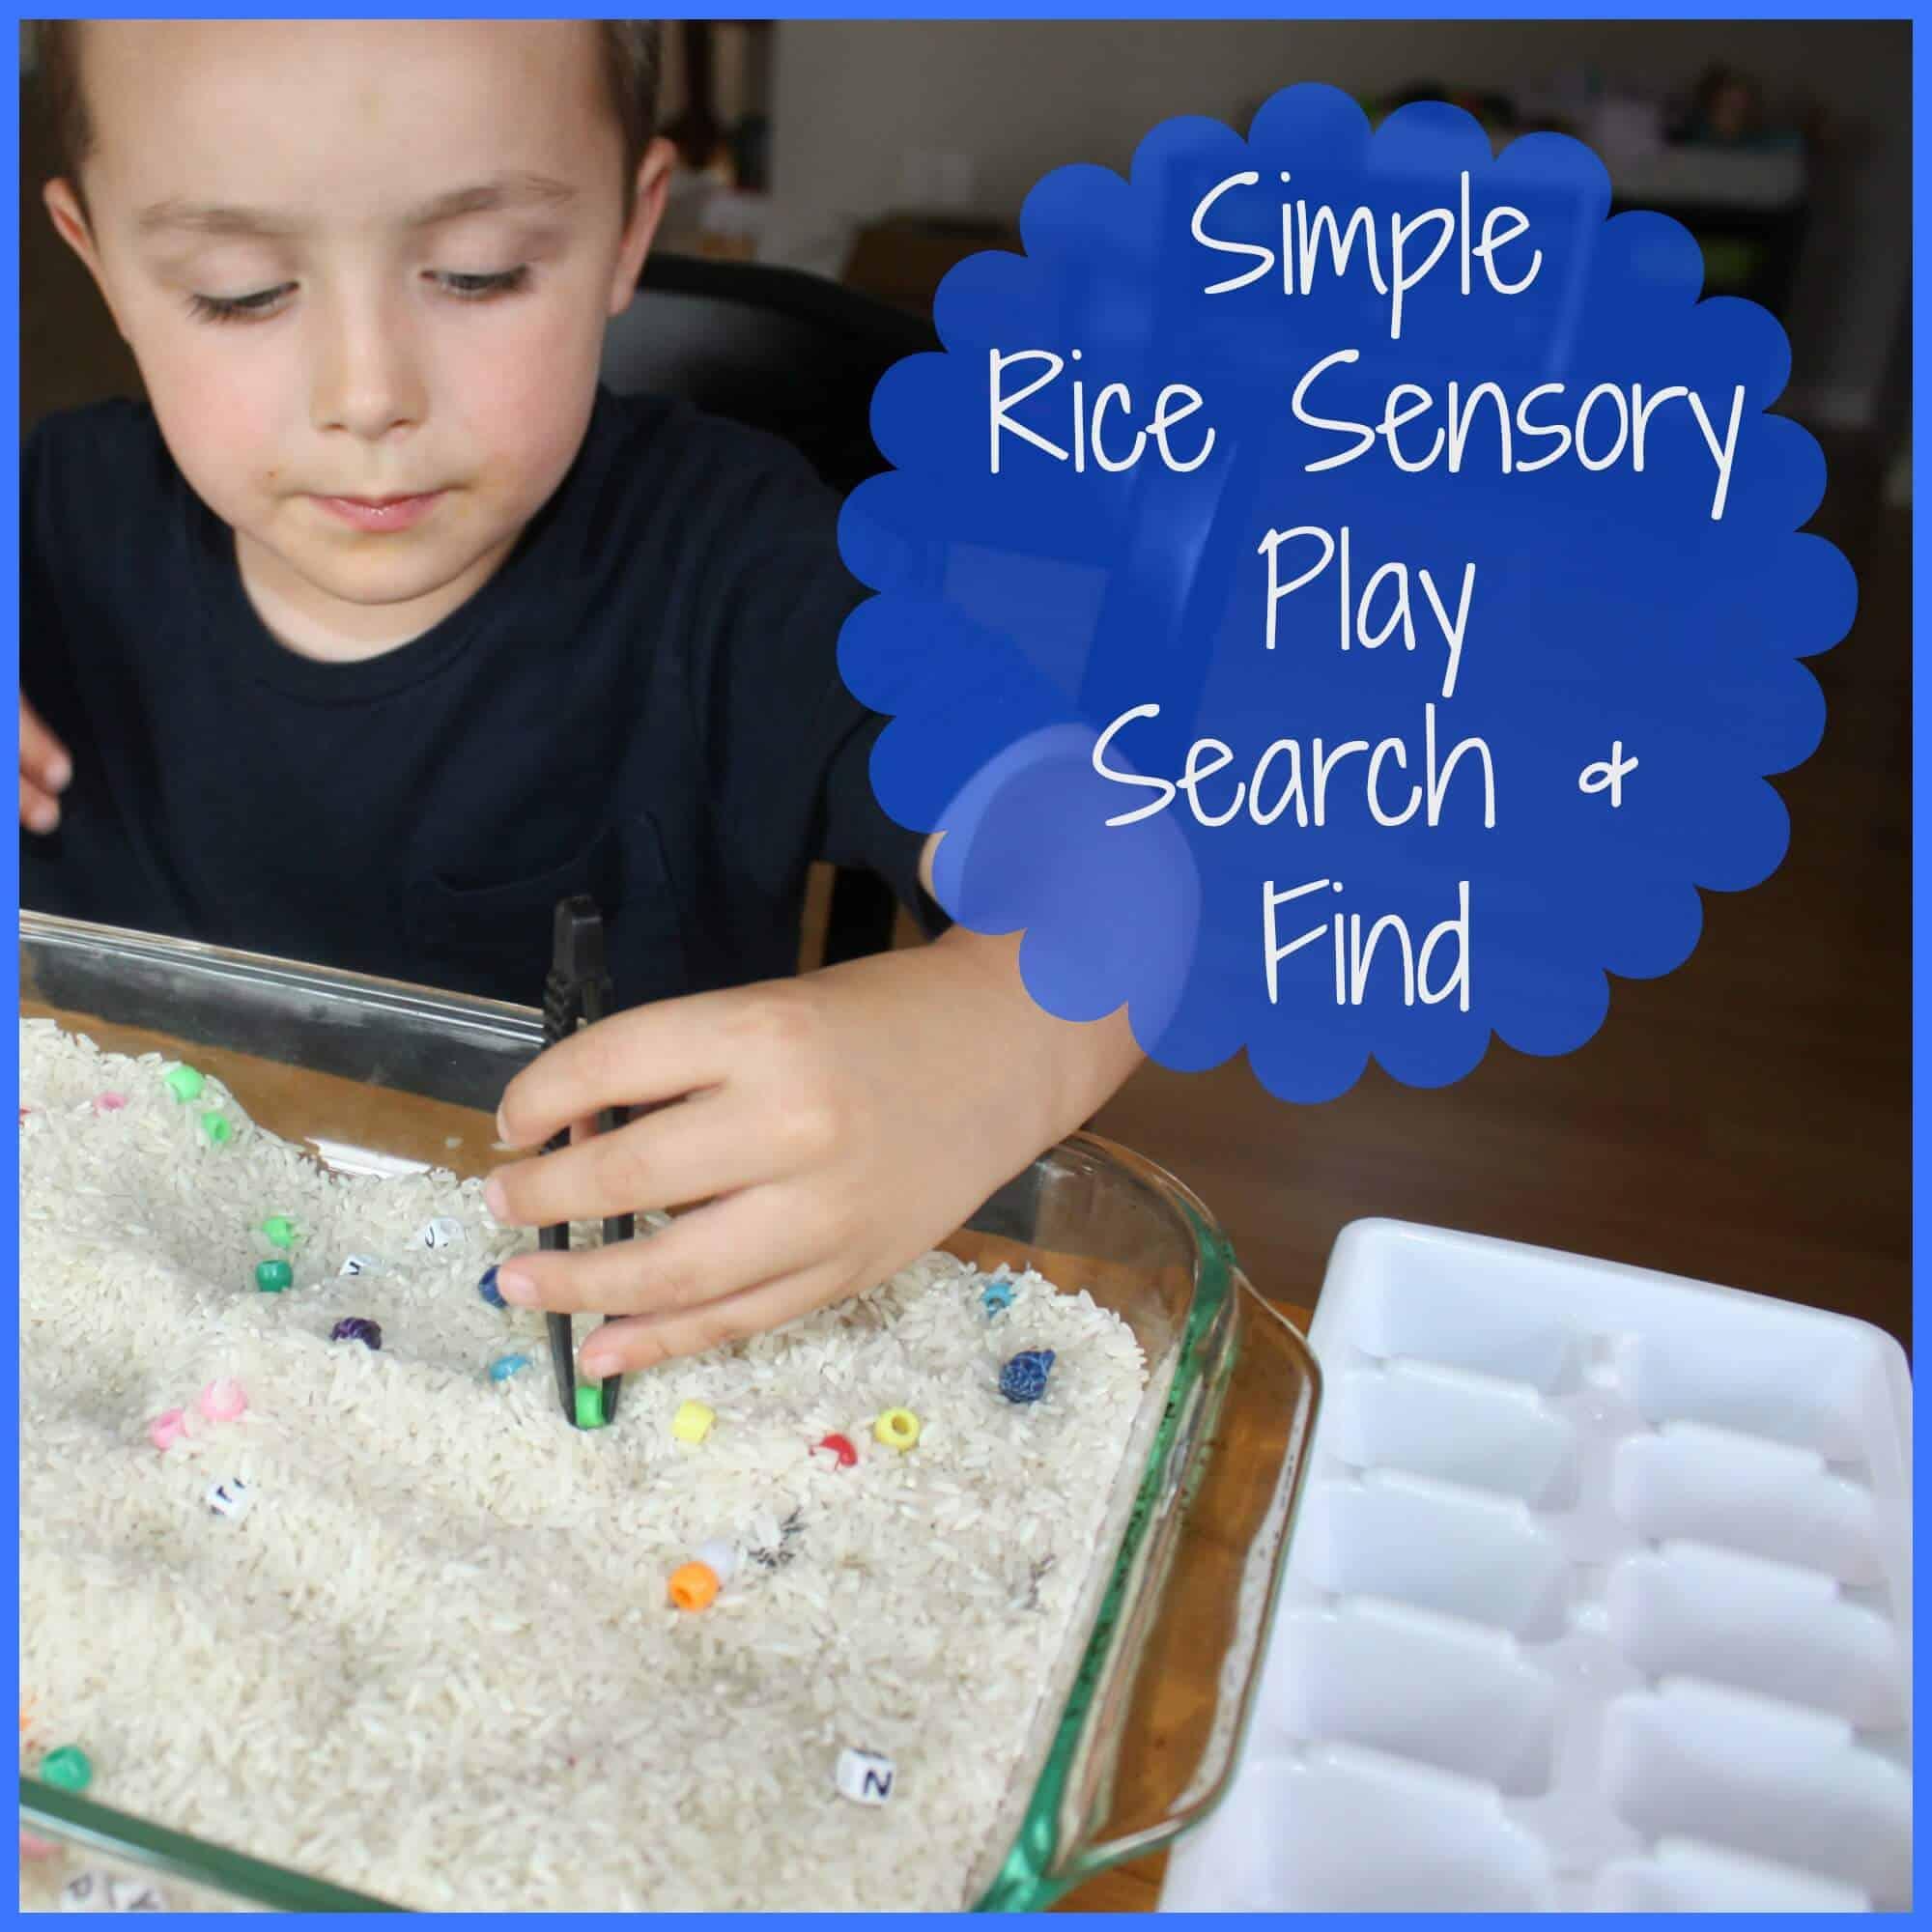 Search & Find Rice Sensory Bin